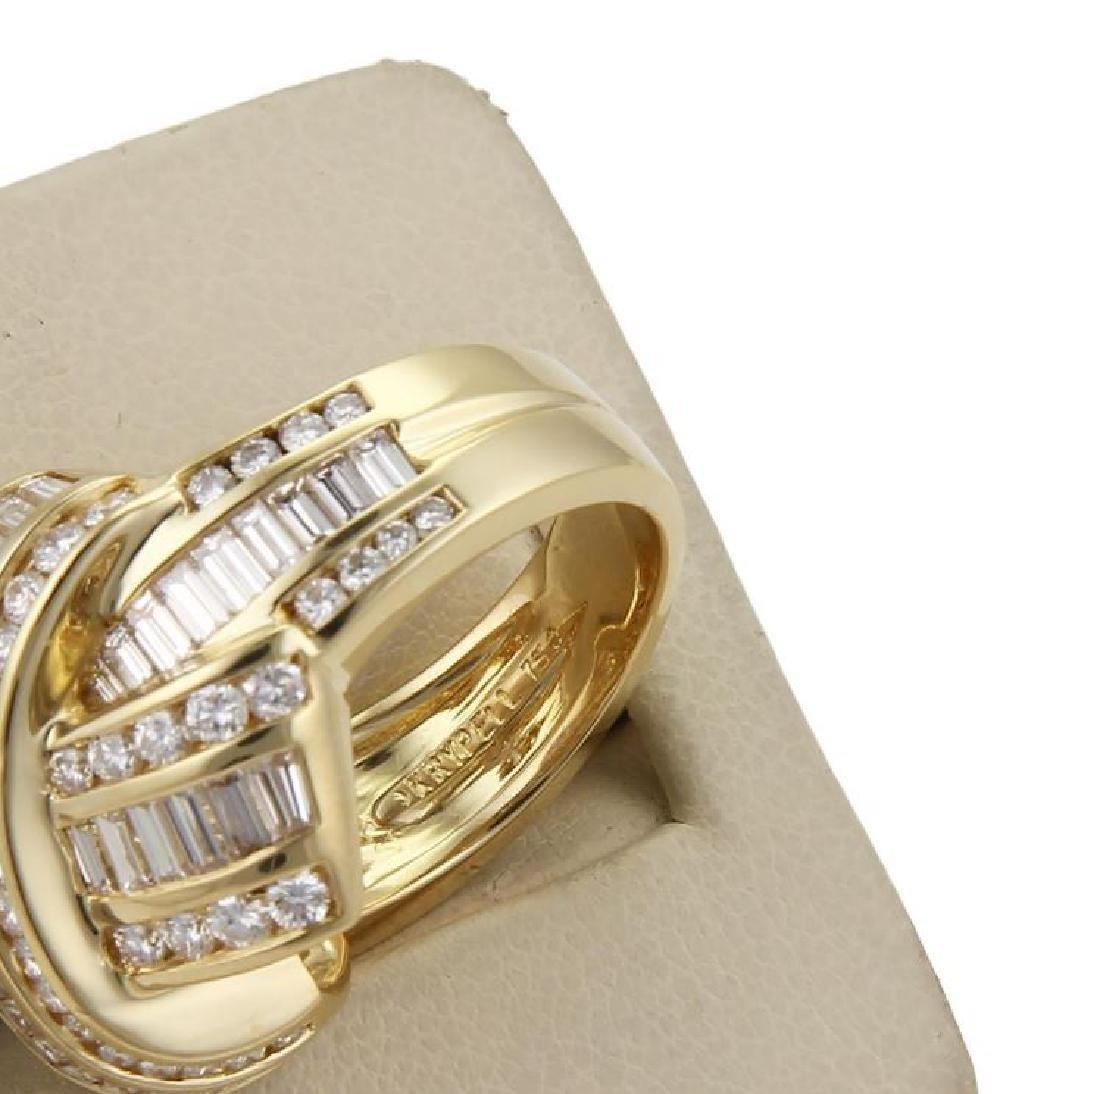 Charles Krypell Diamond X Crossover 18k Gold Ring - 5